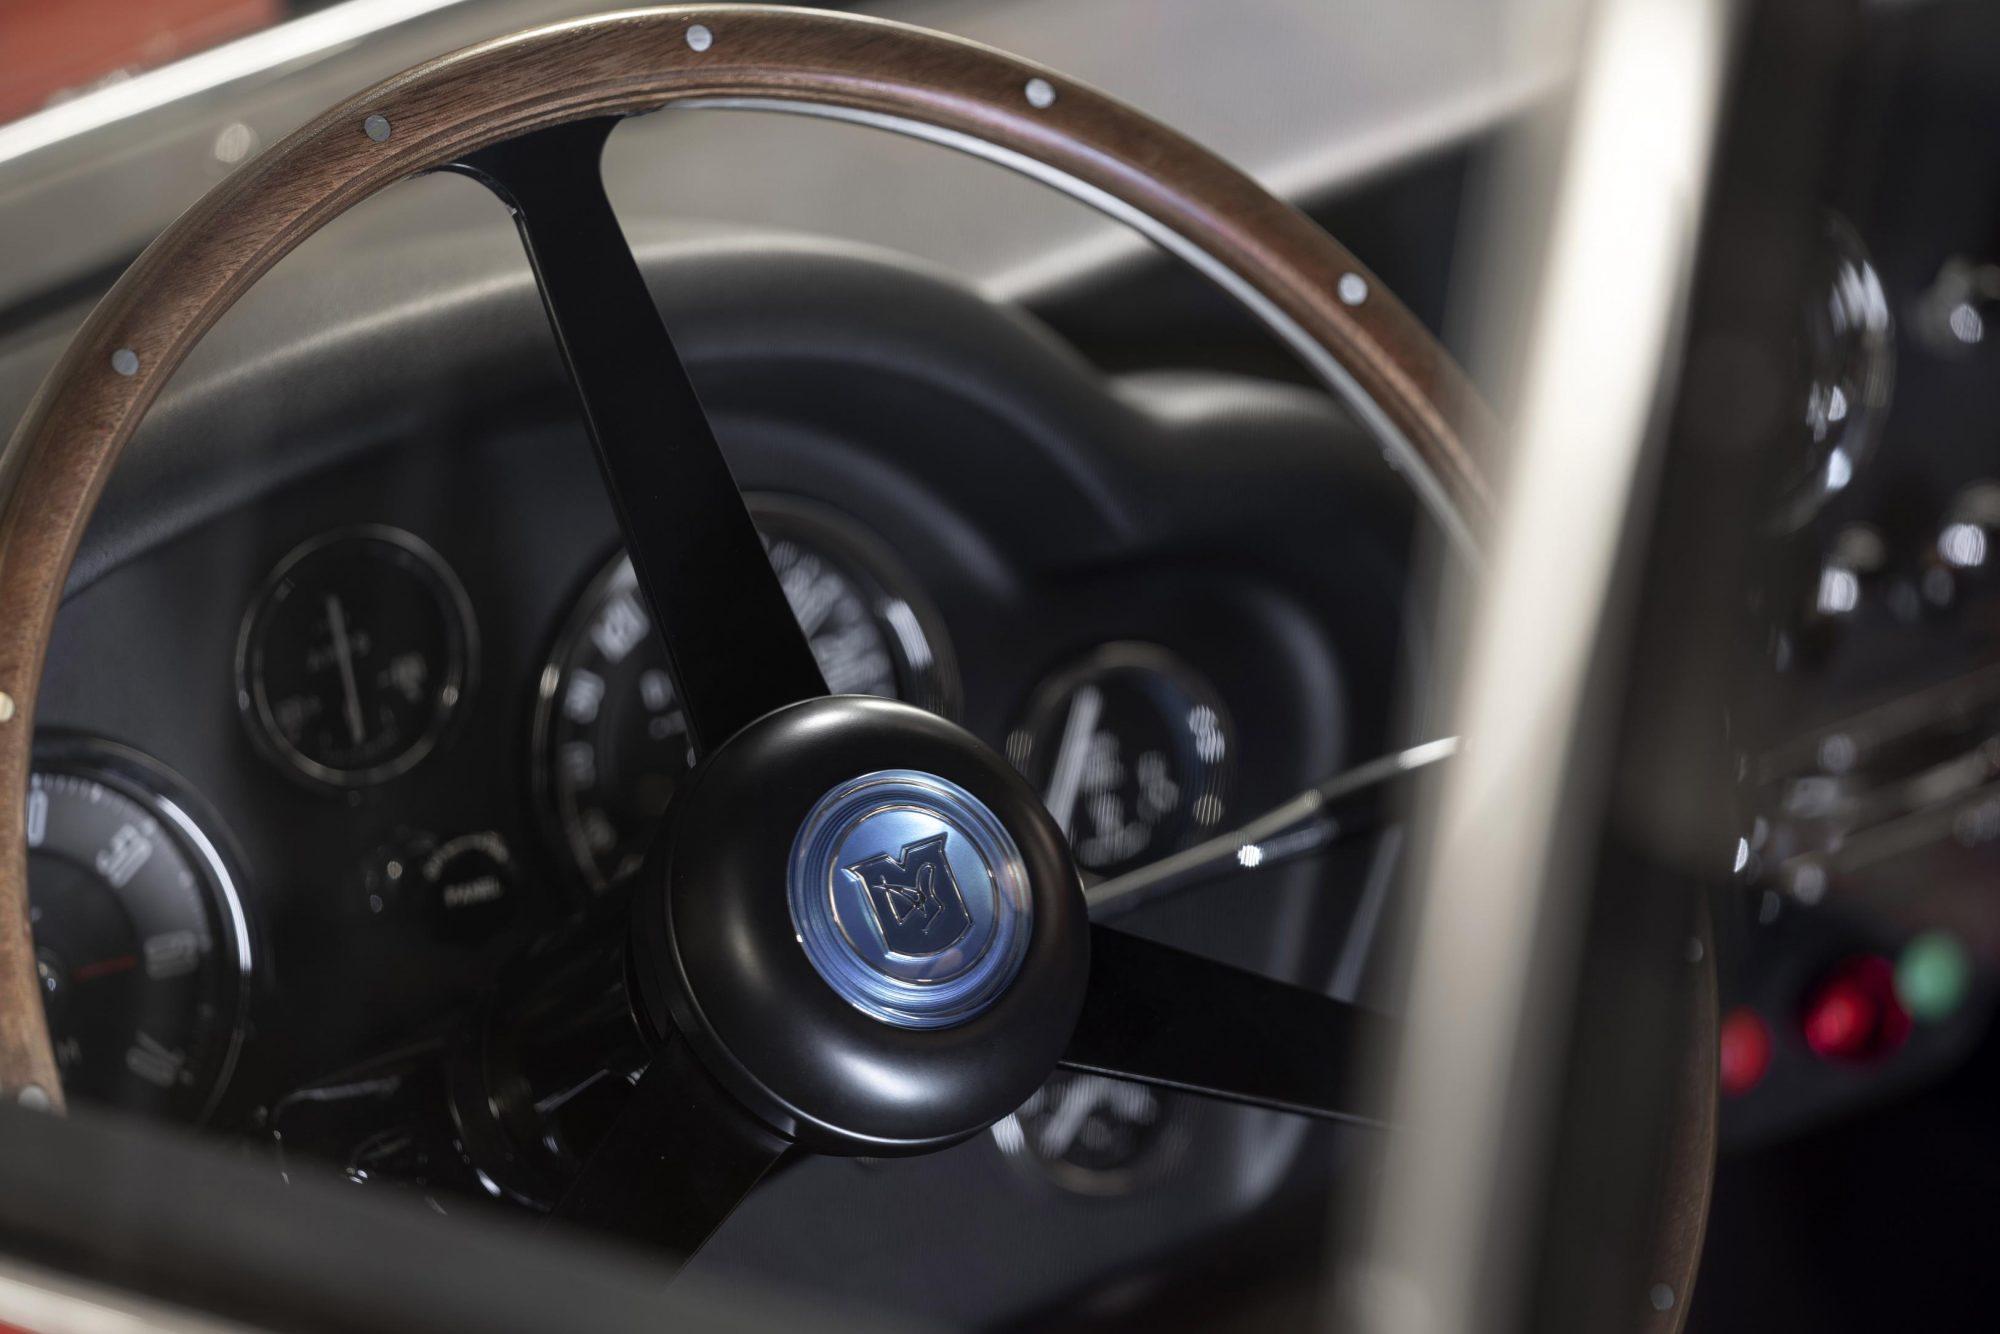 Aston Martin, Aston martin DB4 Zagato, DB4, Zagato, Zagato Continuation, DB4 interior